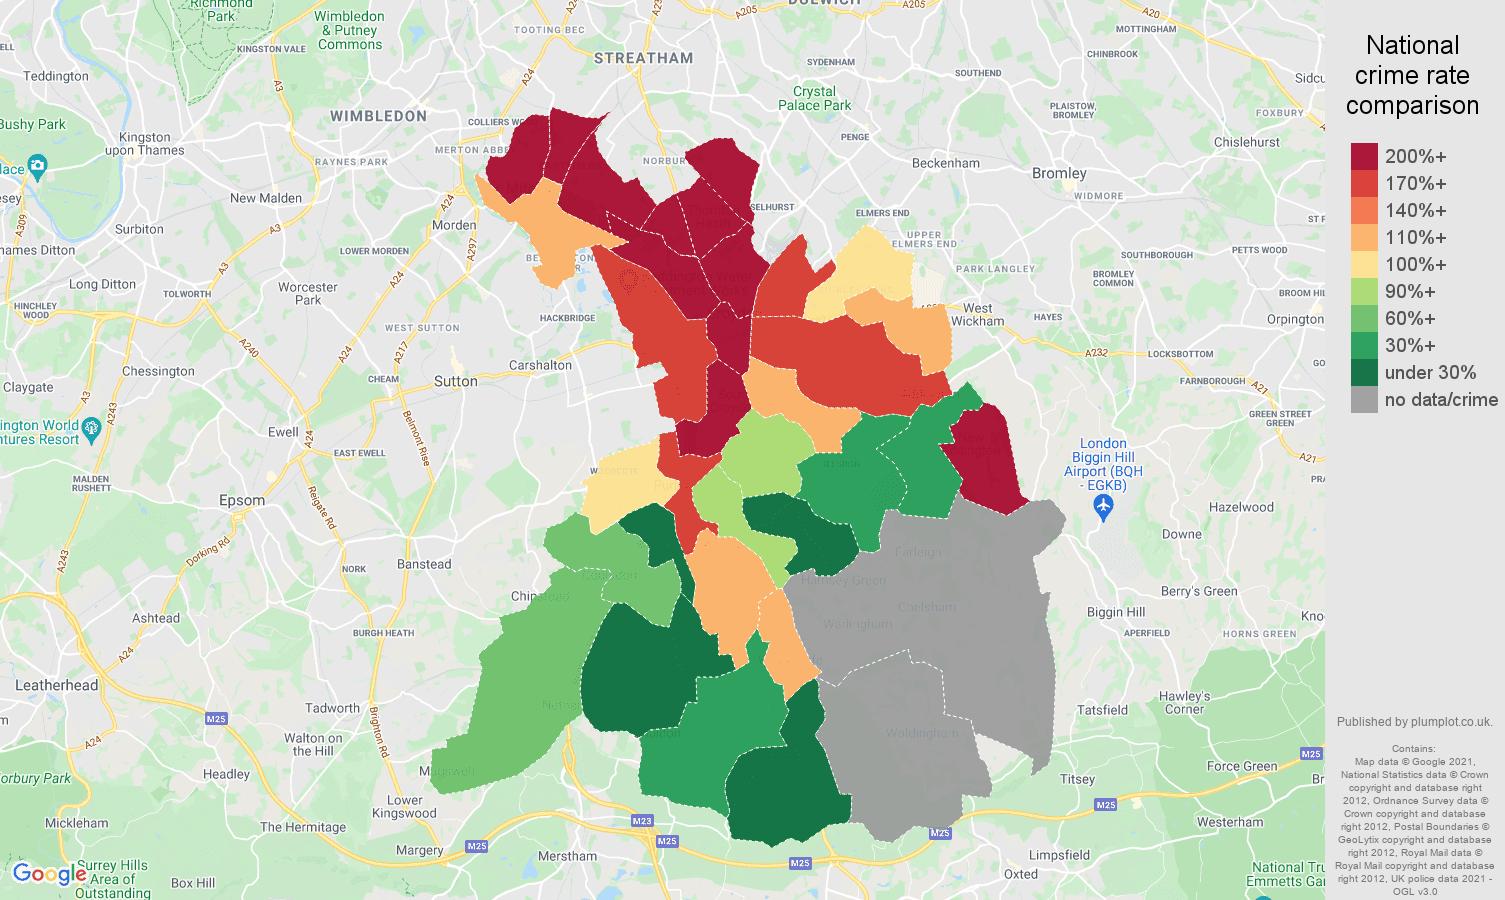 Croydon robbery crime rate comparison map